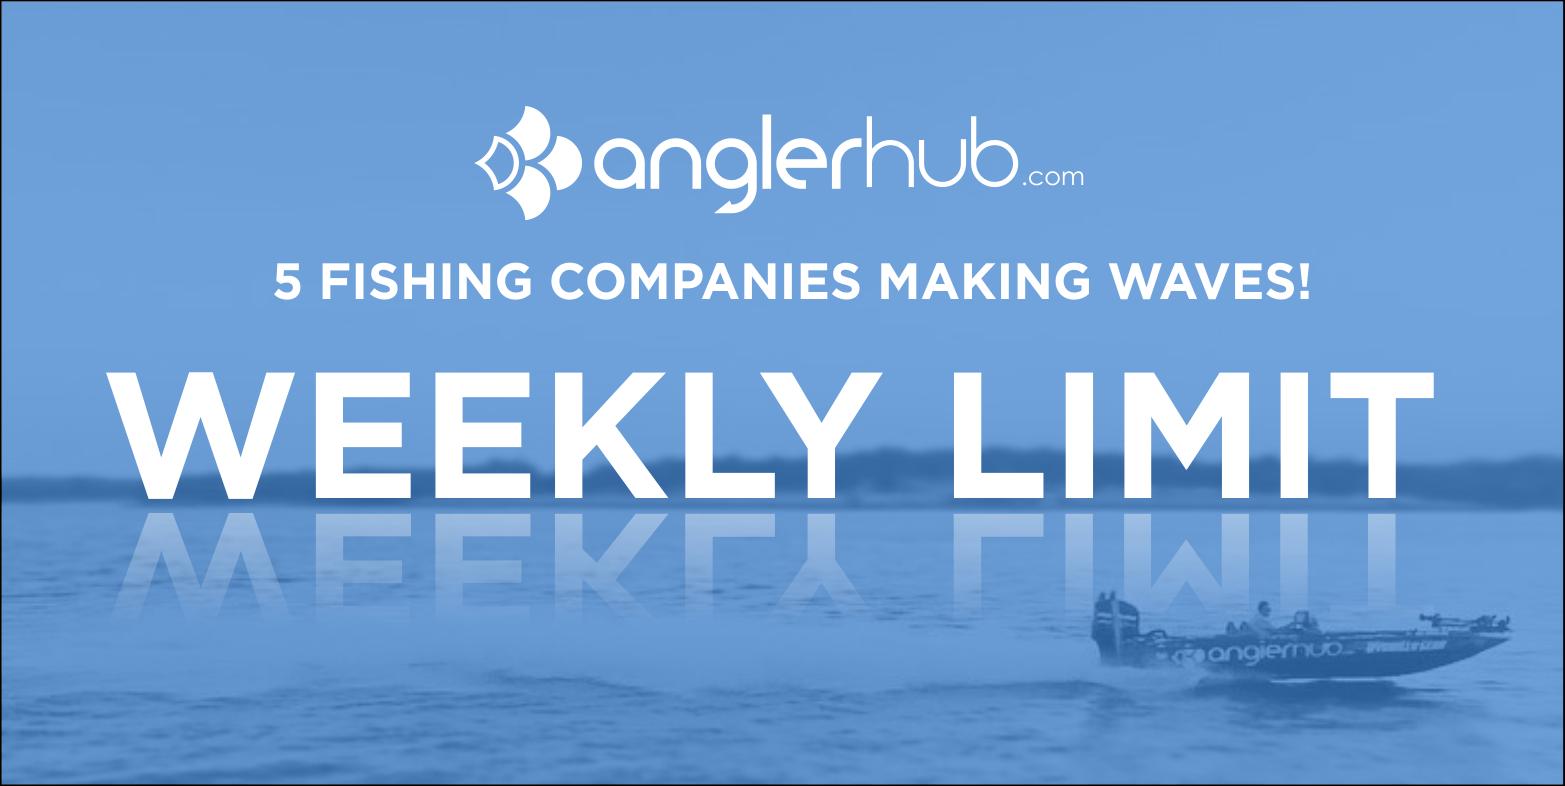 Five fishing companies making waves!